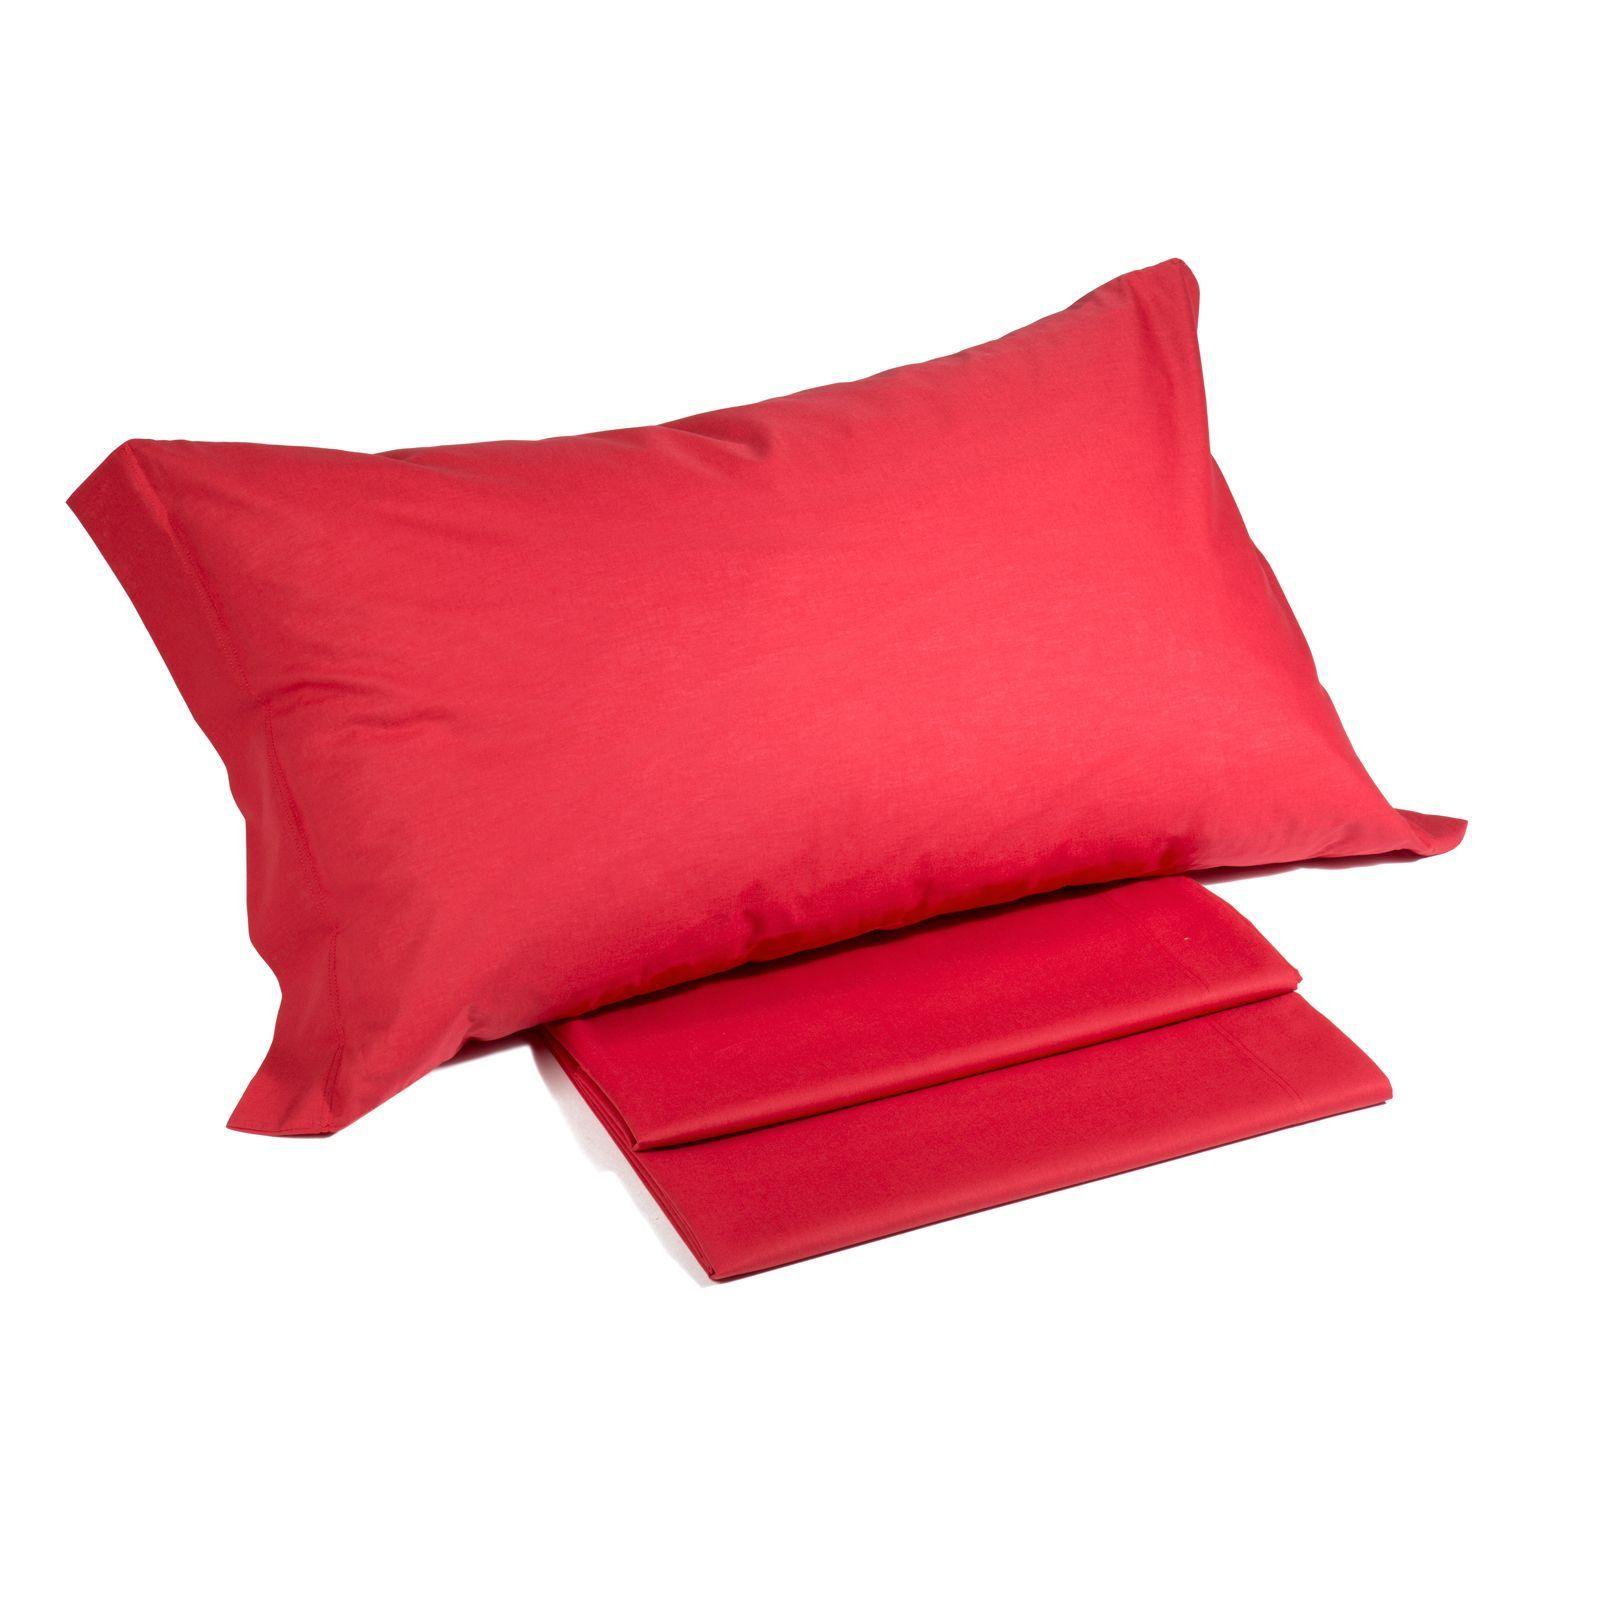 Наволочки для сна Наволочки 2шт 52х82 Caleffi Tinta Unita красные elitnye-navolochki-hlopkovye-unita-krasnye-ot-caleffi-italiya.jpg